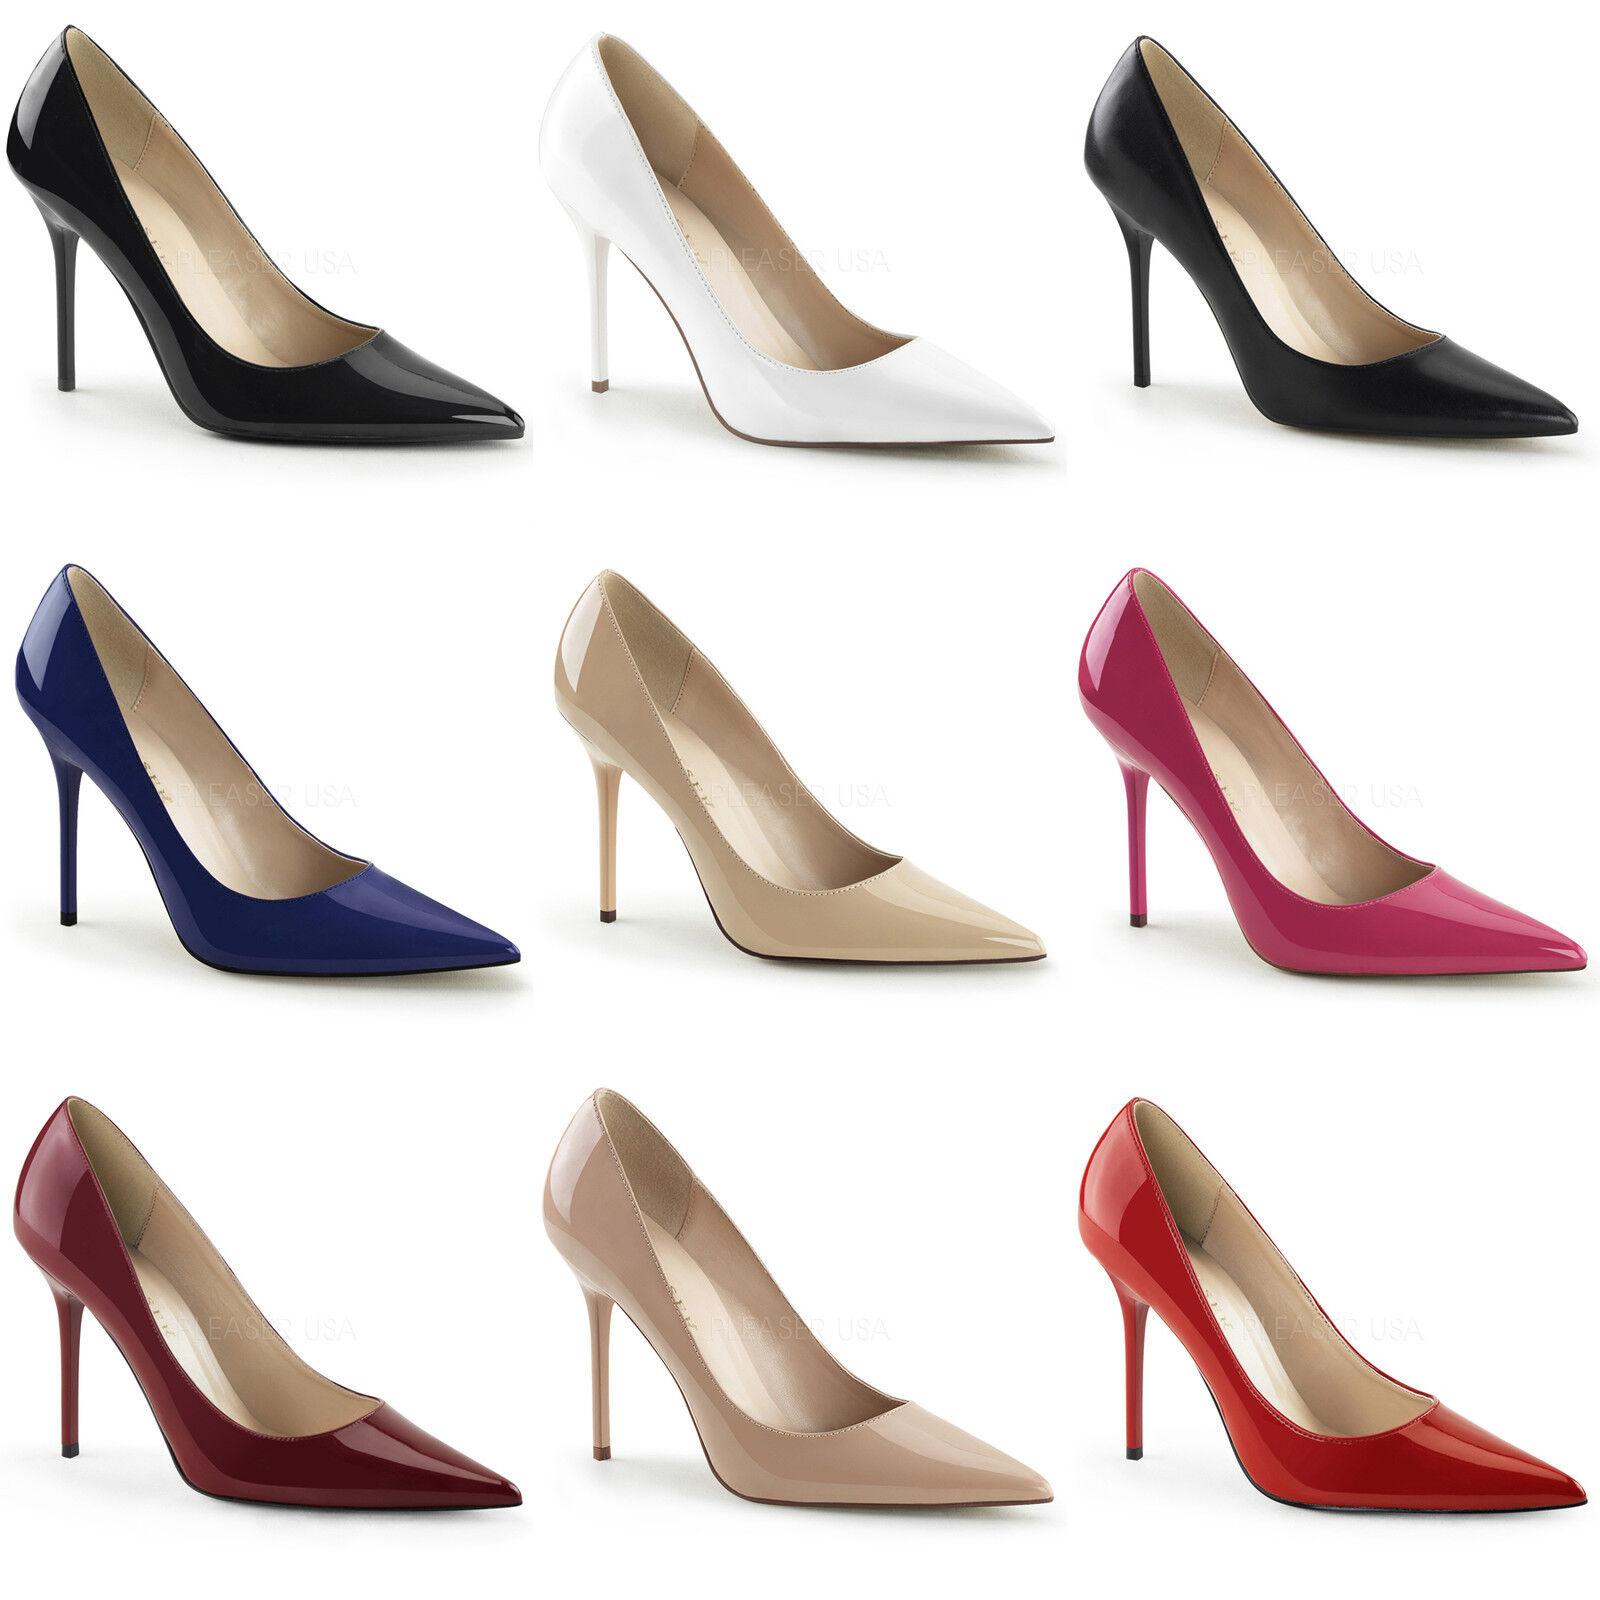 Classique 20 elegante Heels Pleaser Damen Pumps High Heels elegante Pumps Damen aaf2ba